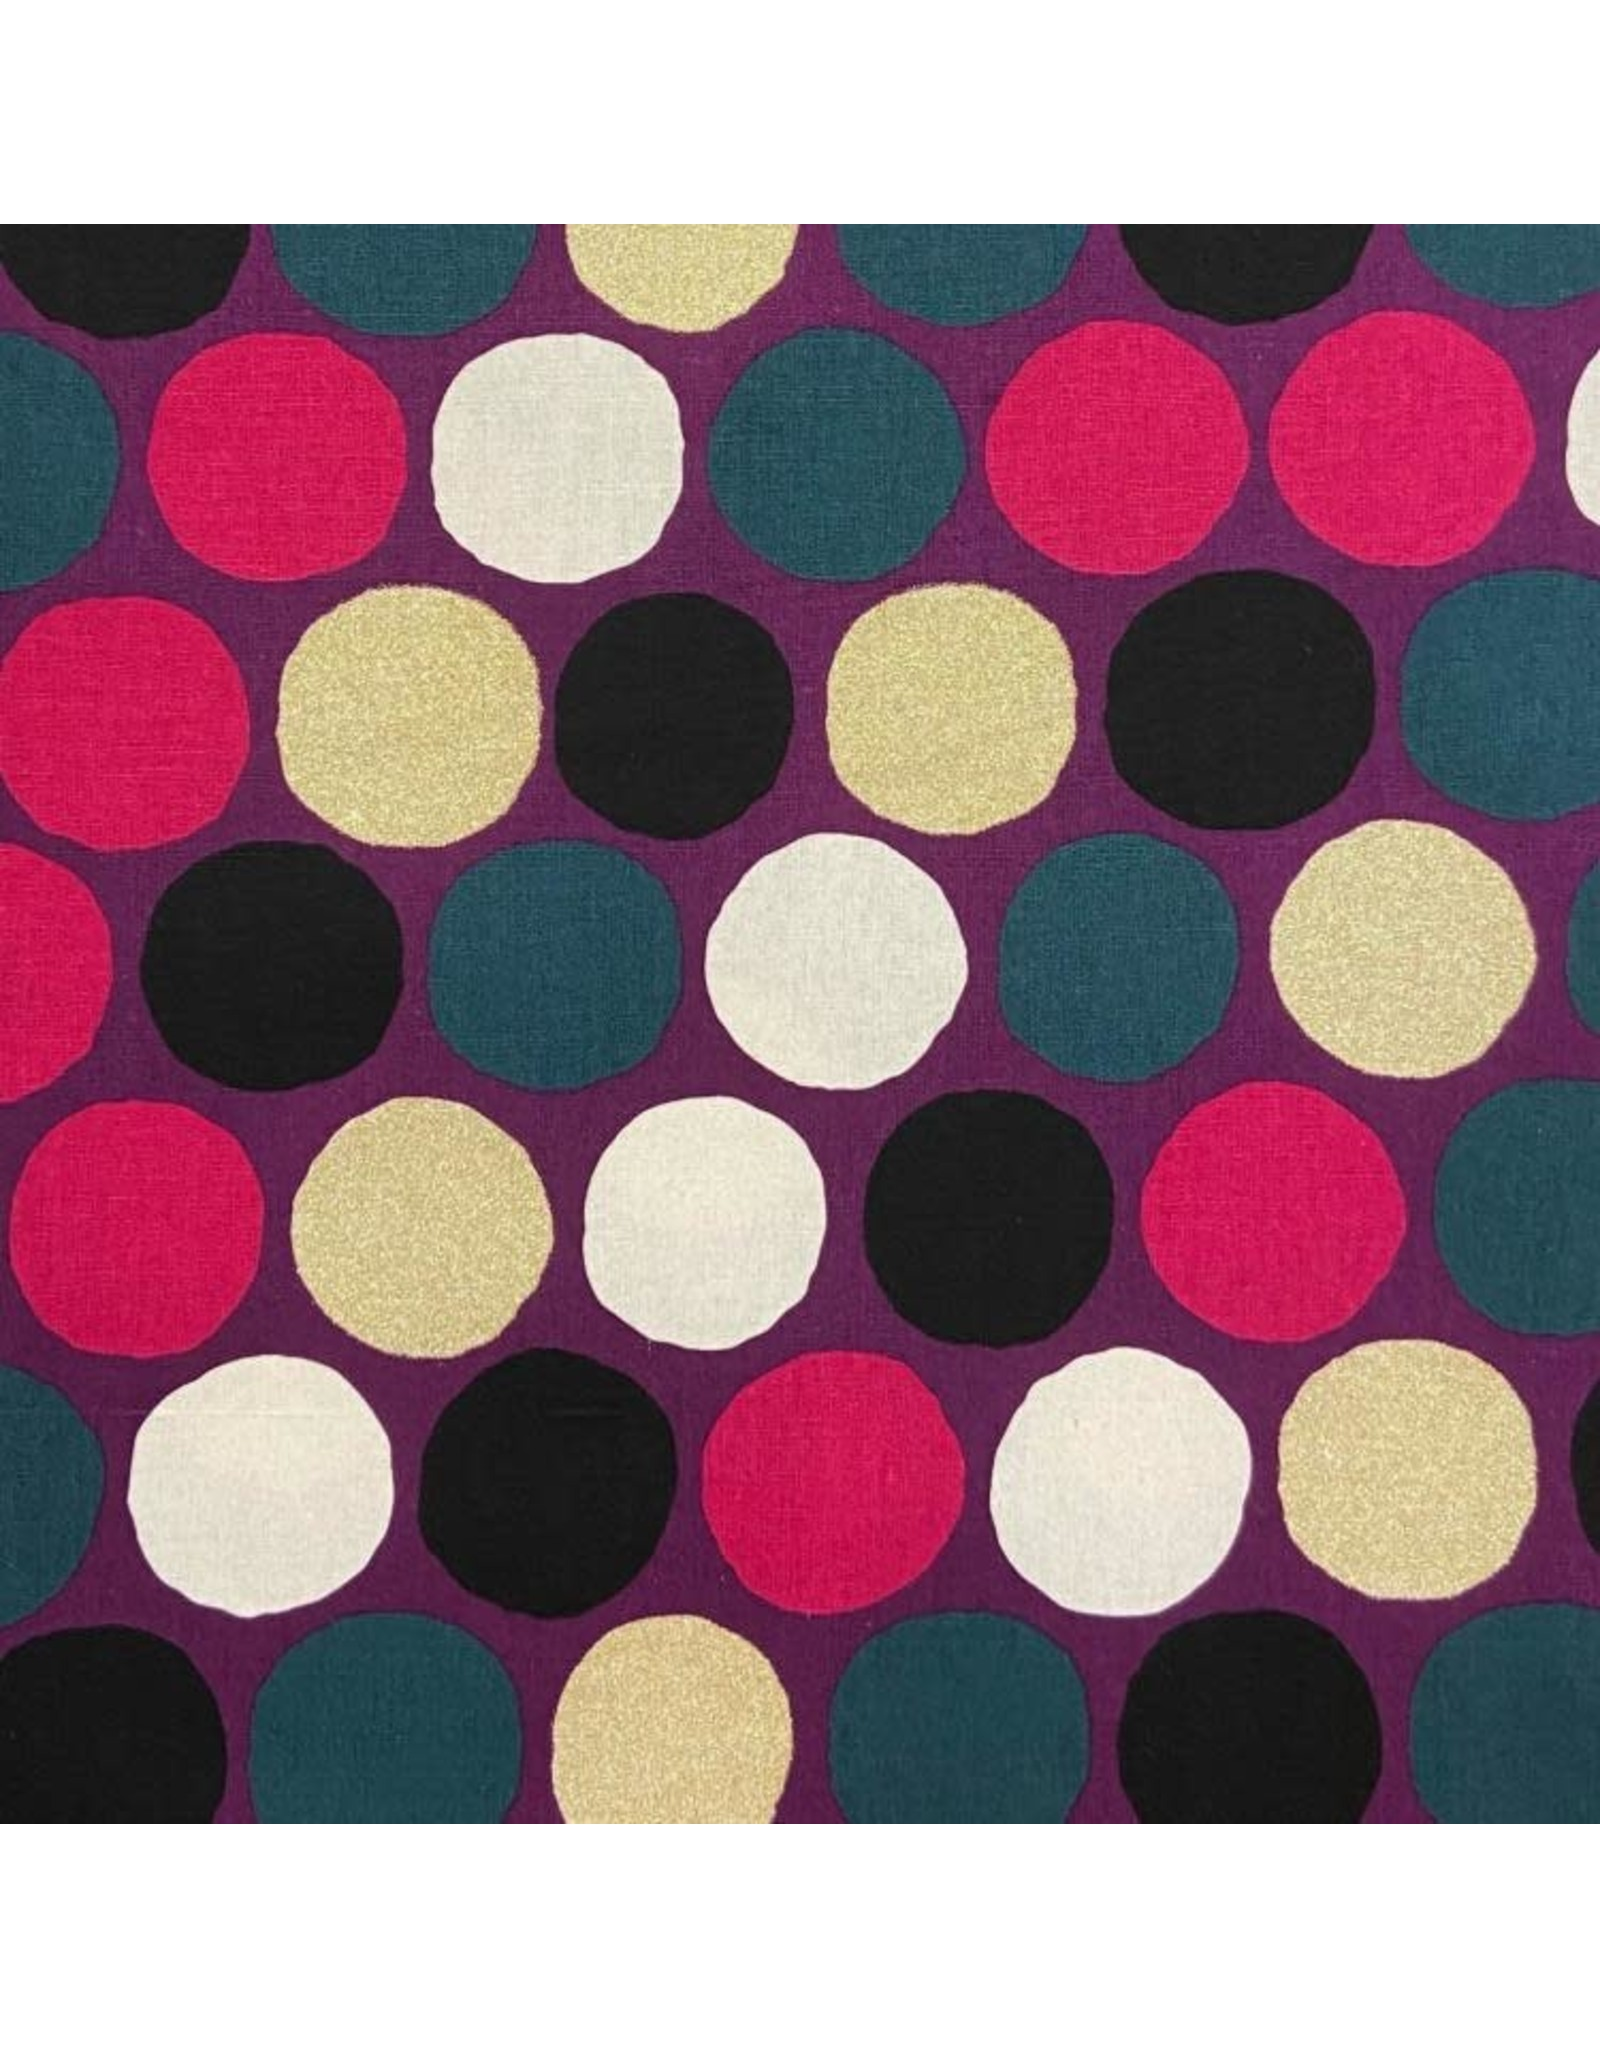 Japan Import Linen/Cotton Canvas, Cosmo Japan, Big Dot in Magenta with Gold Metallic, Fabric Half-Yards AP-92912-B